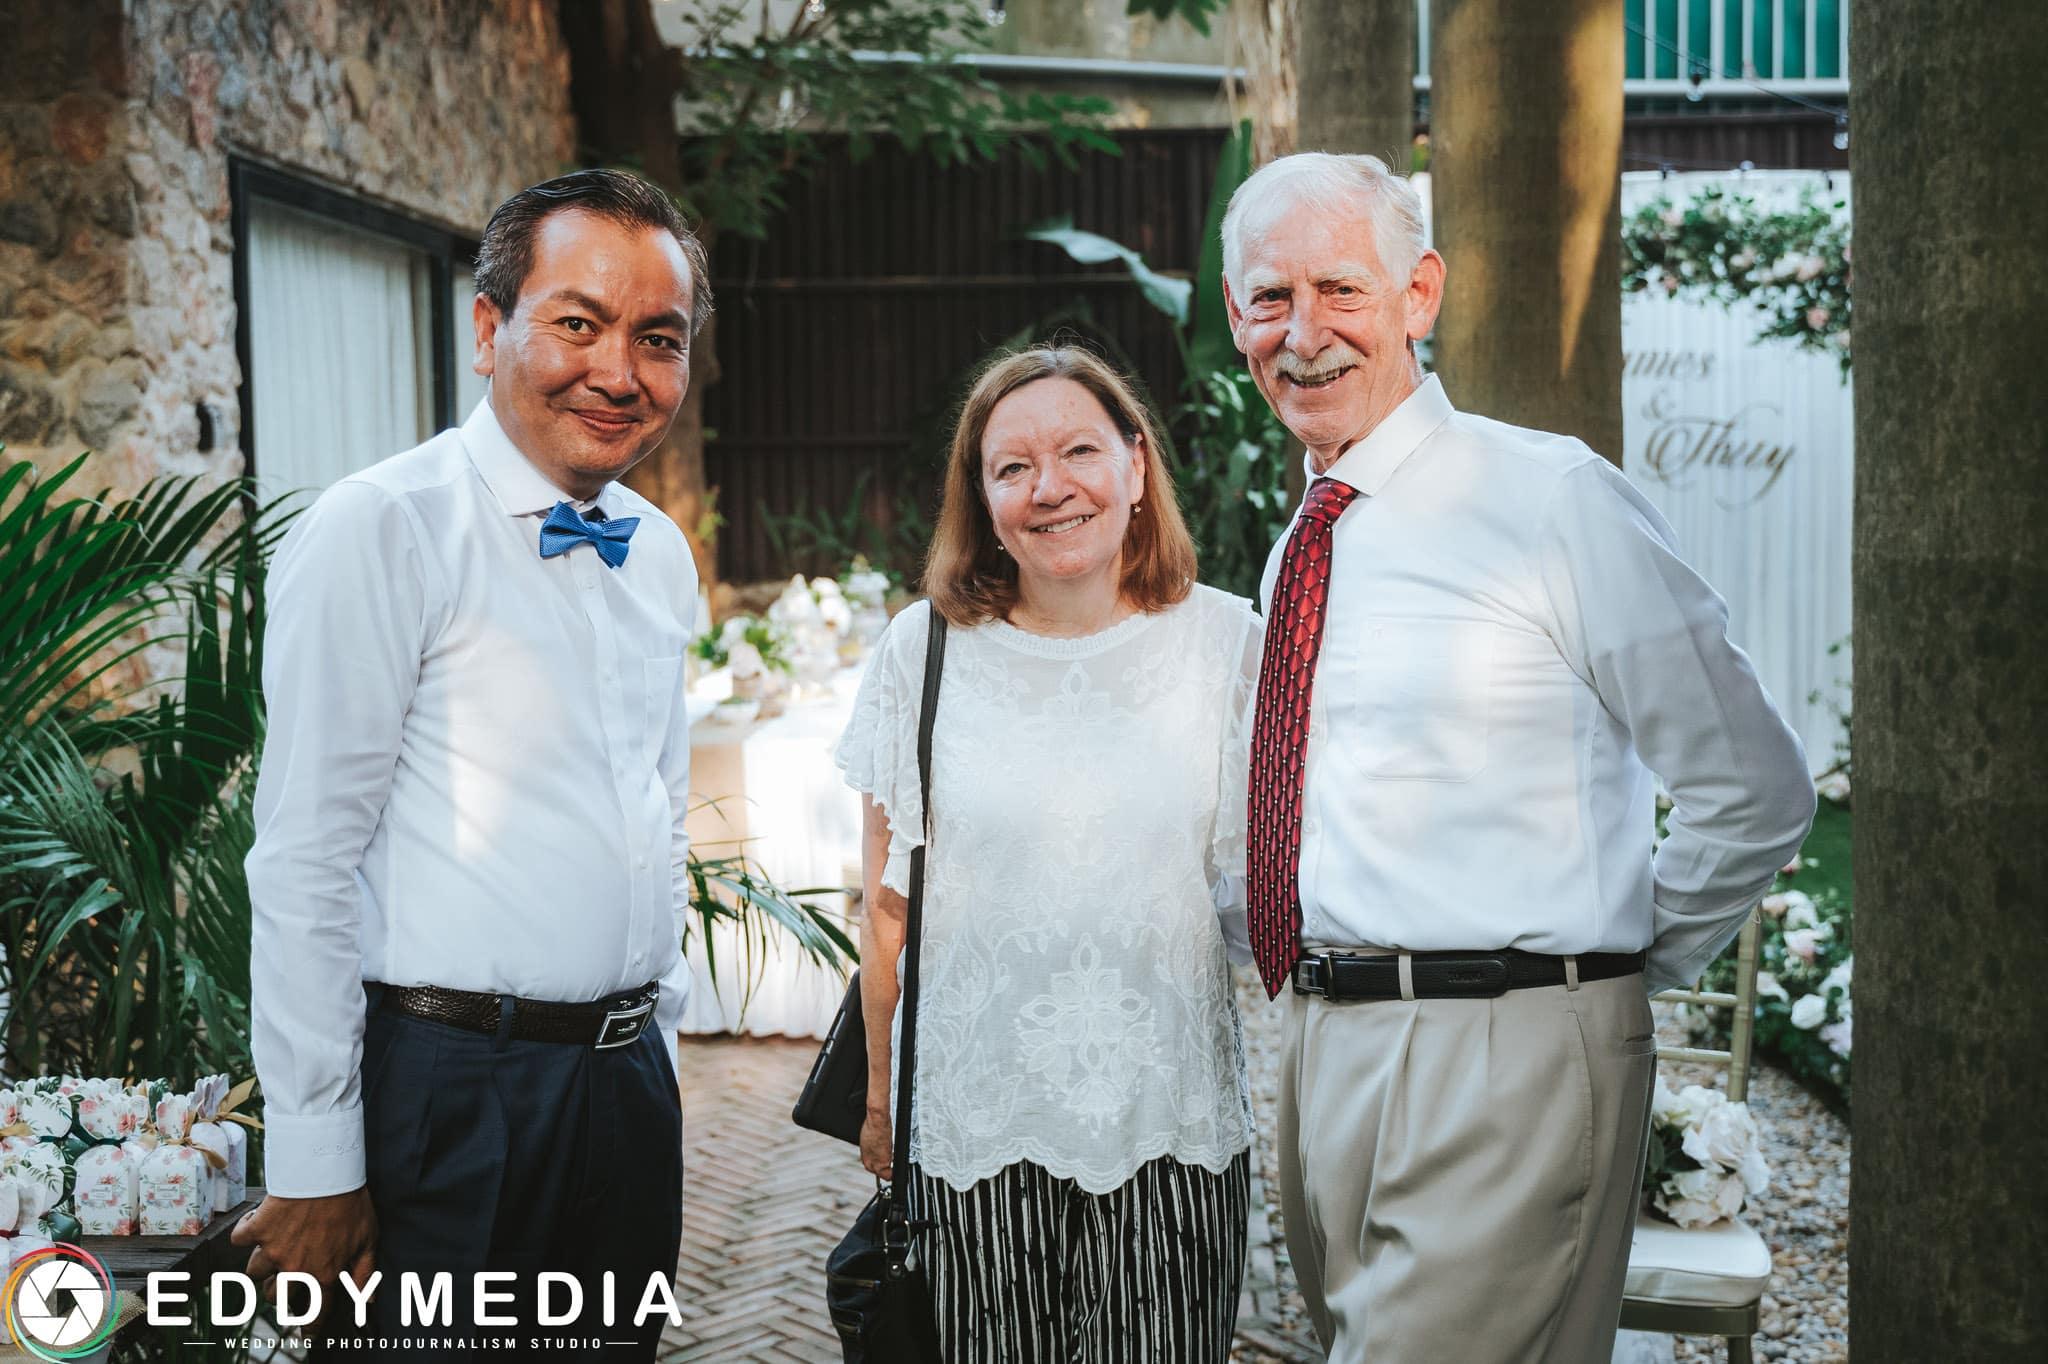 Phongsucuoi James KieuThuy EddyMedia 14 tiệc cưới ngoài trời